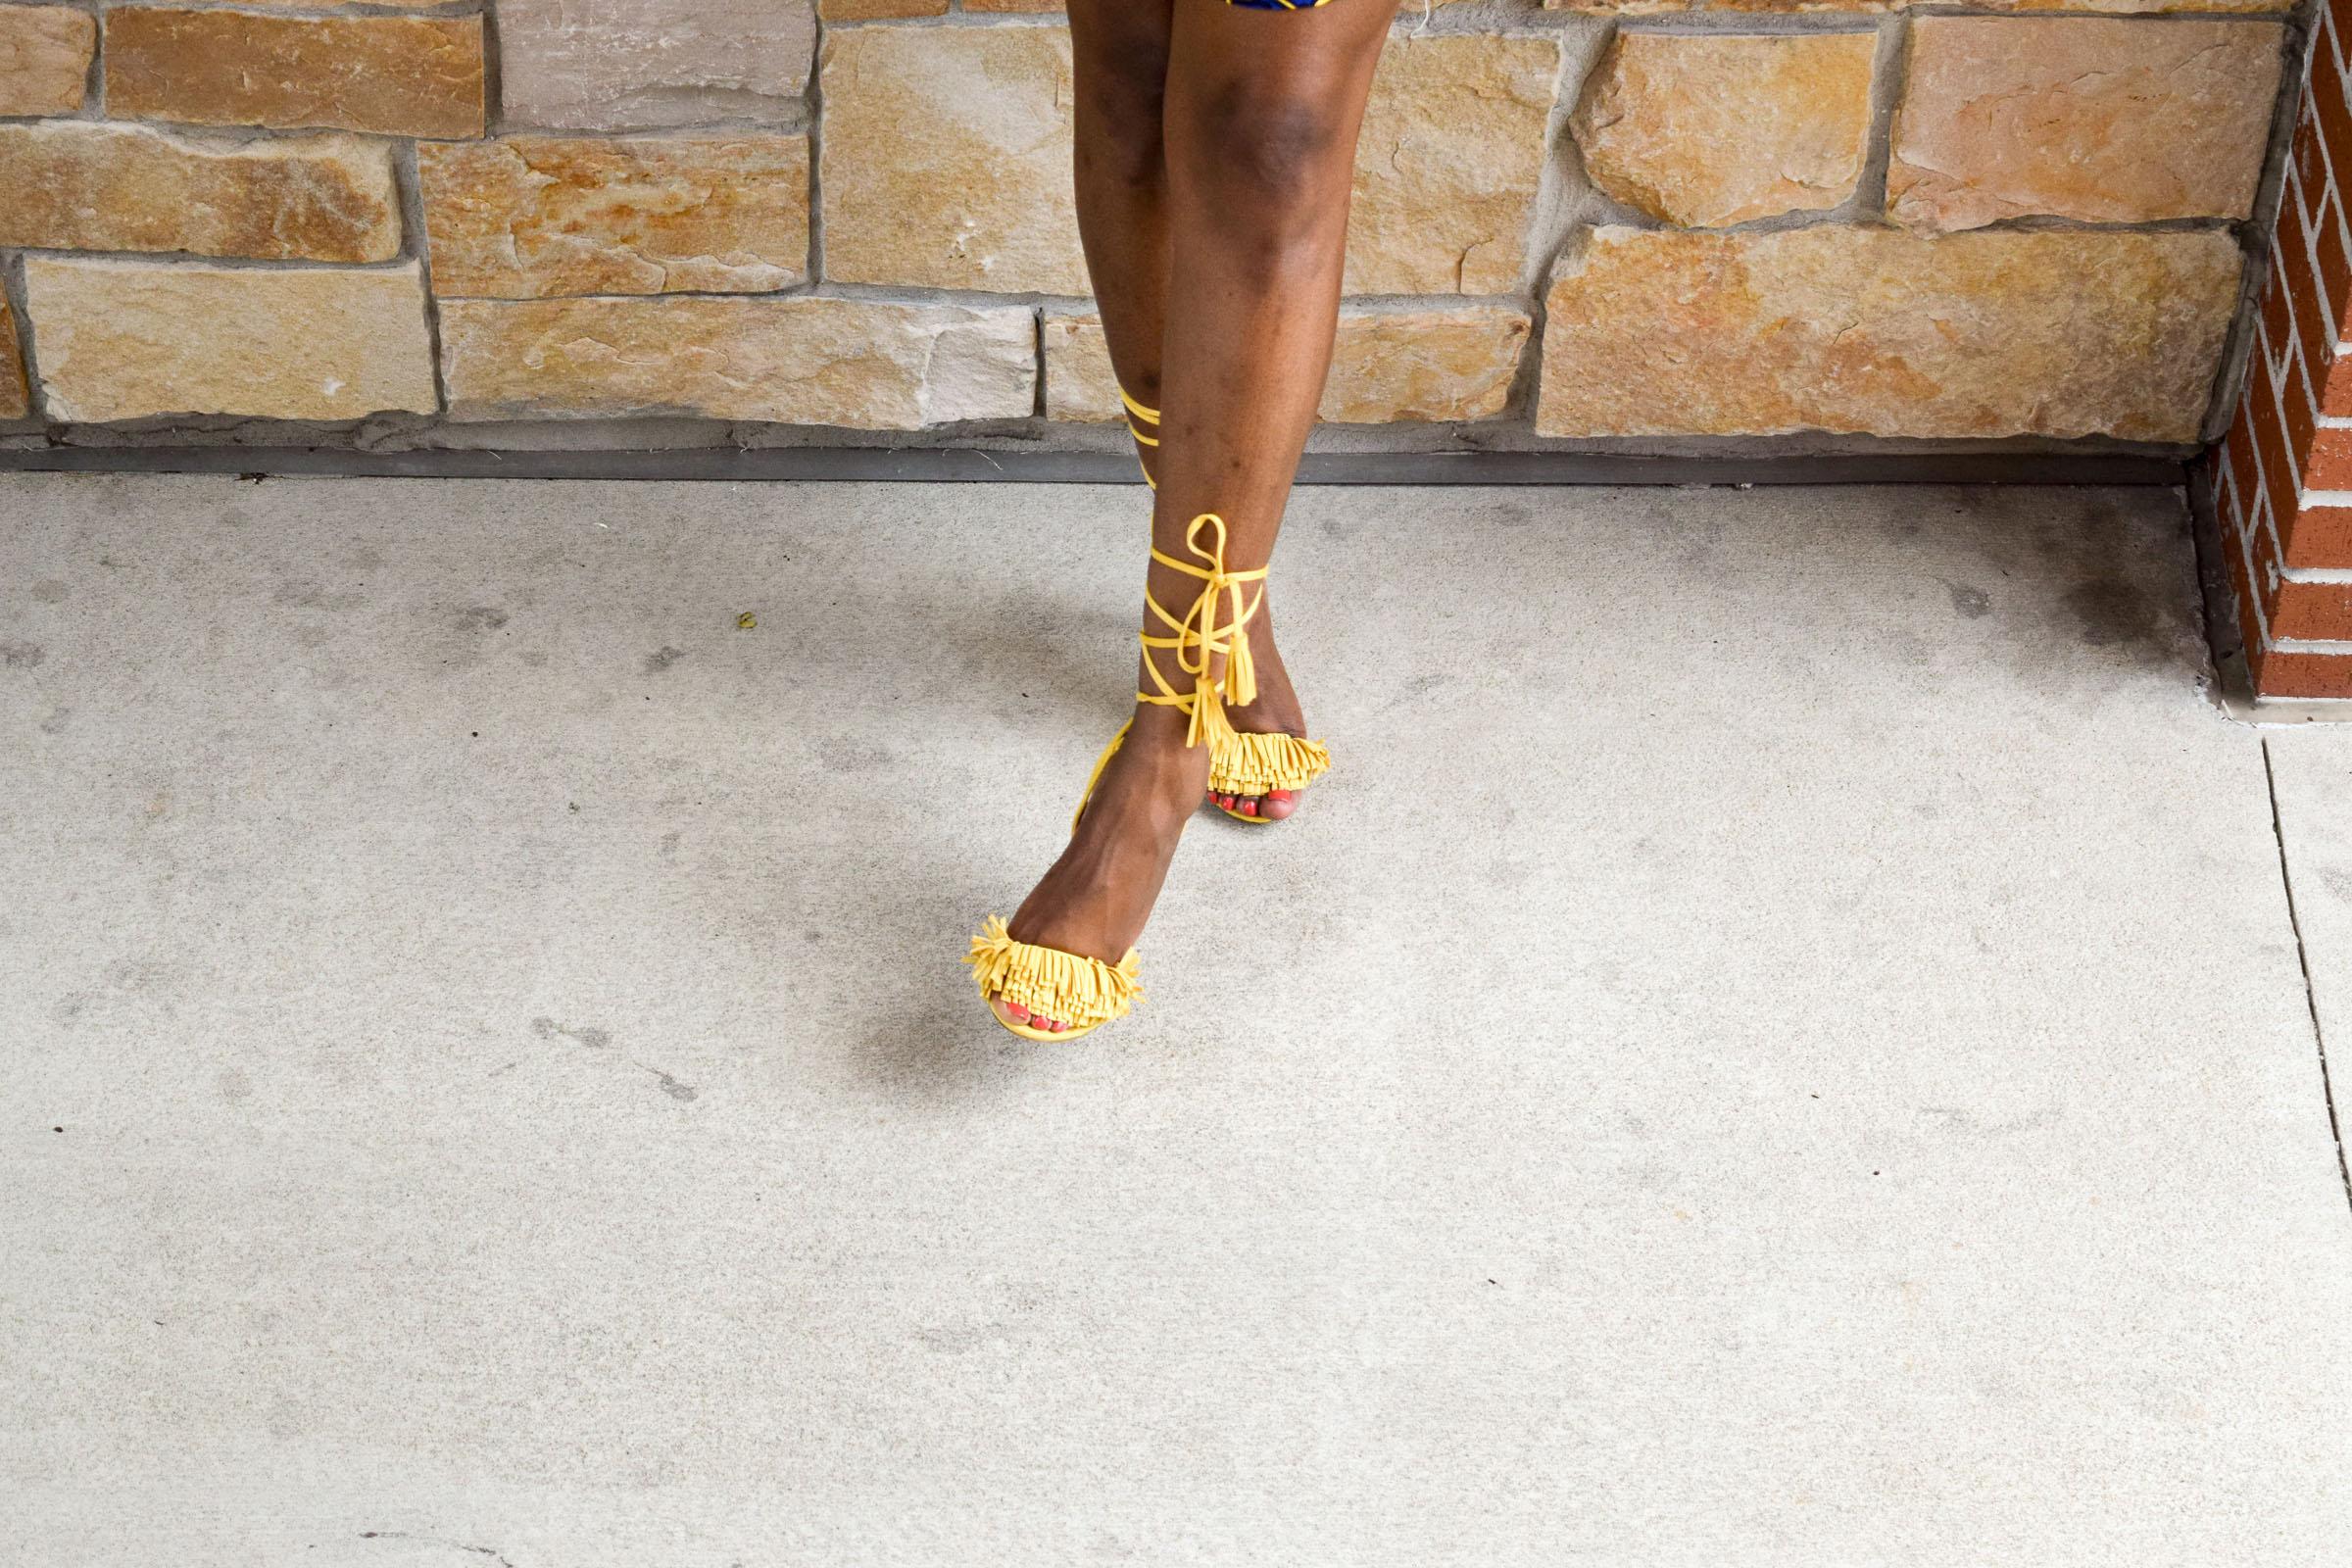 Style-Files-Target-Marimeko-collection -floral-tunic-justfab-tayrey-yellow-fringe-heels-sandals-yellow-turban-asos-denim-choker-oohlalablog-23